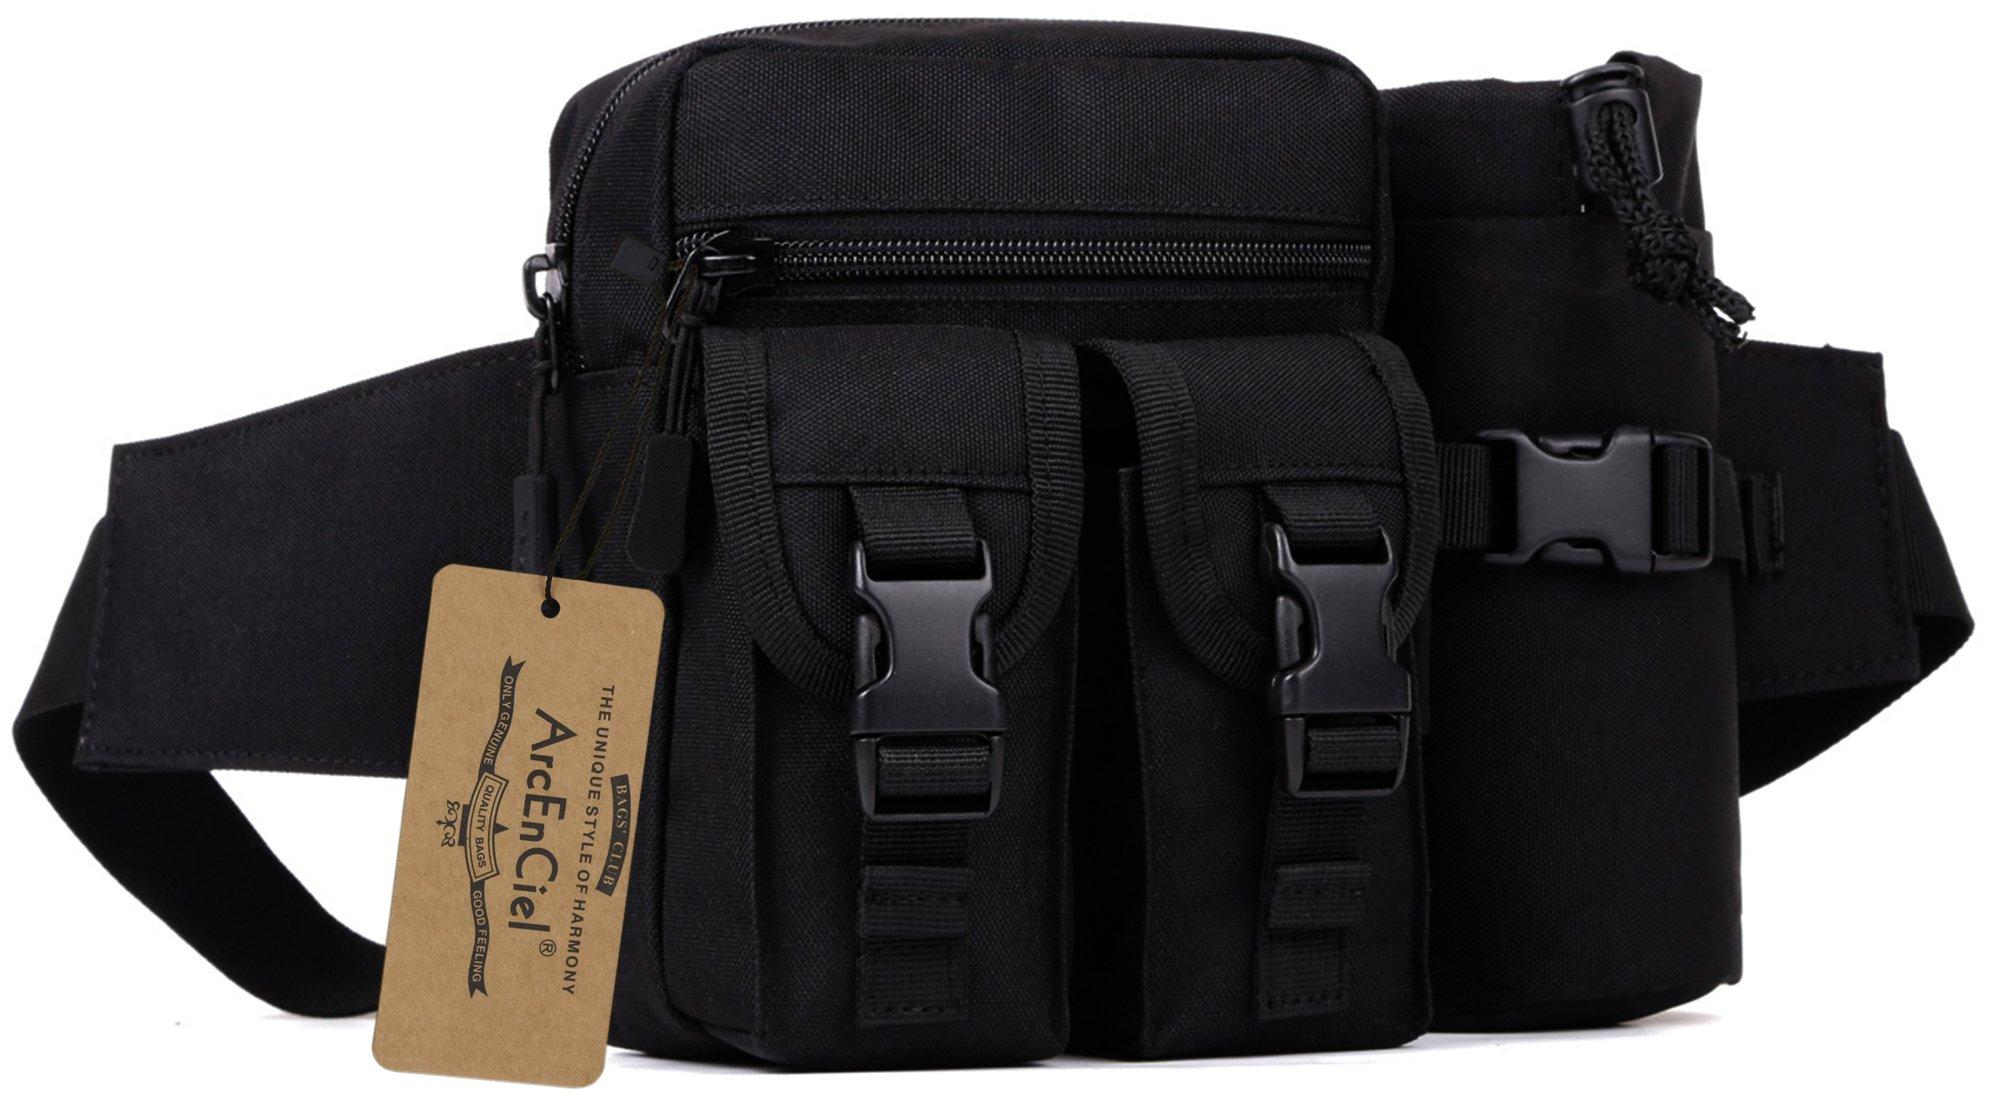 ArcEnCiel Tactical Fanny Pack Waist Bag Military Hip Belt Outdoor Fishing Bumbag with Water Bottle Pocket Holder